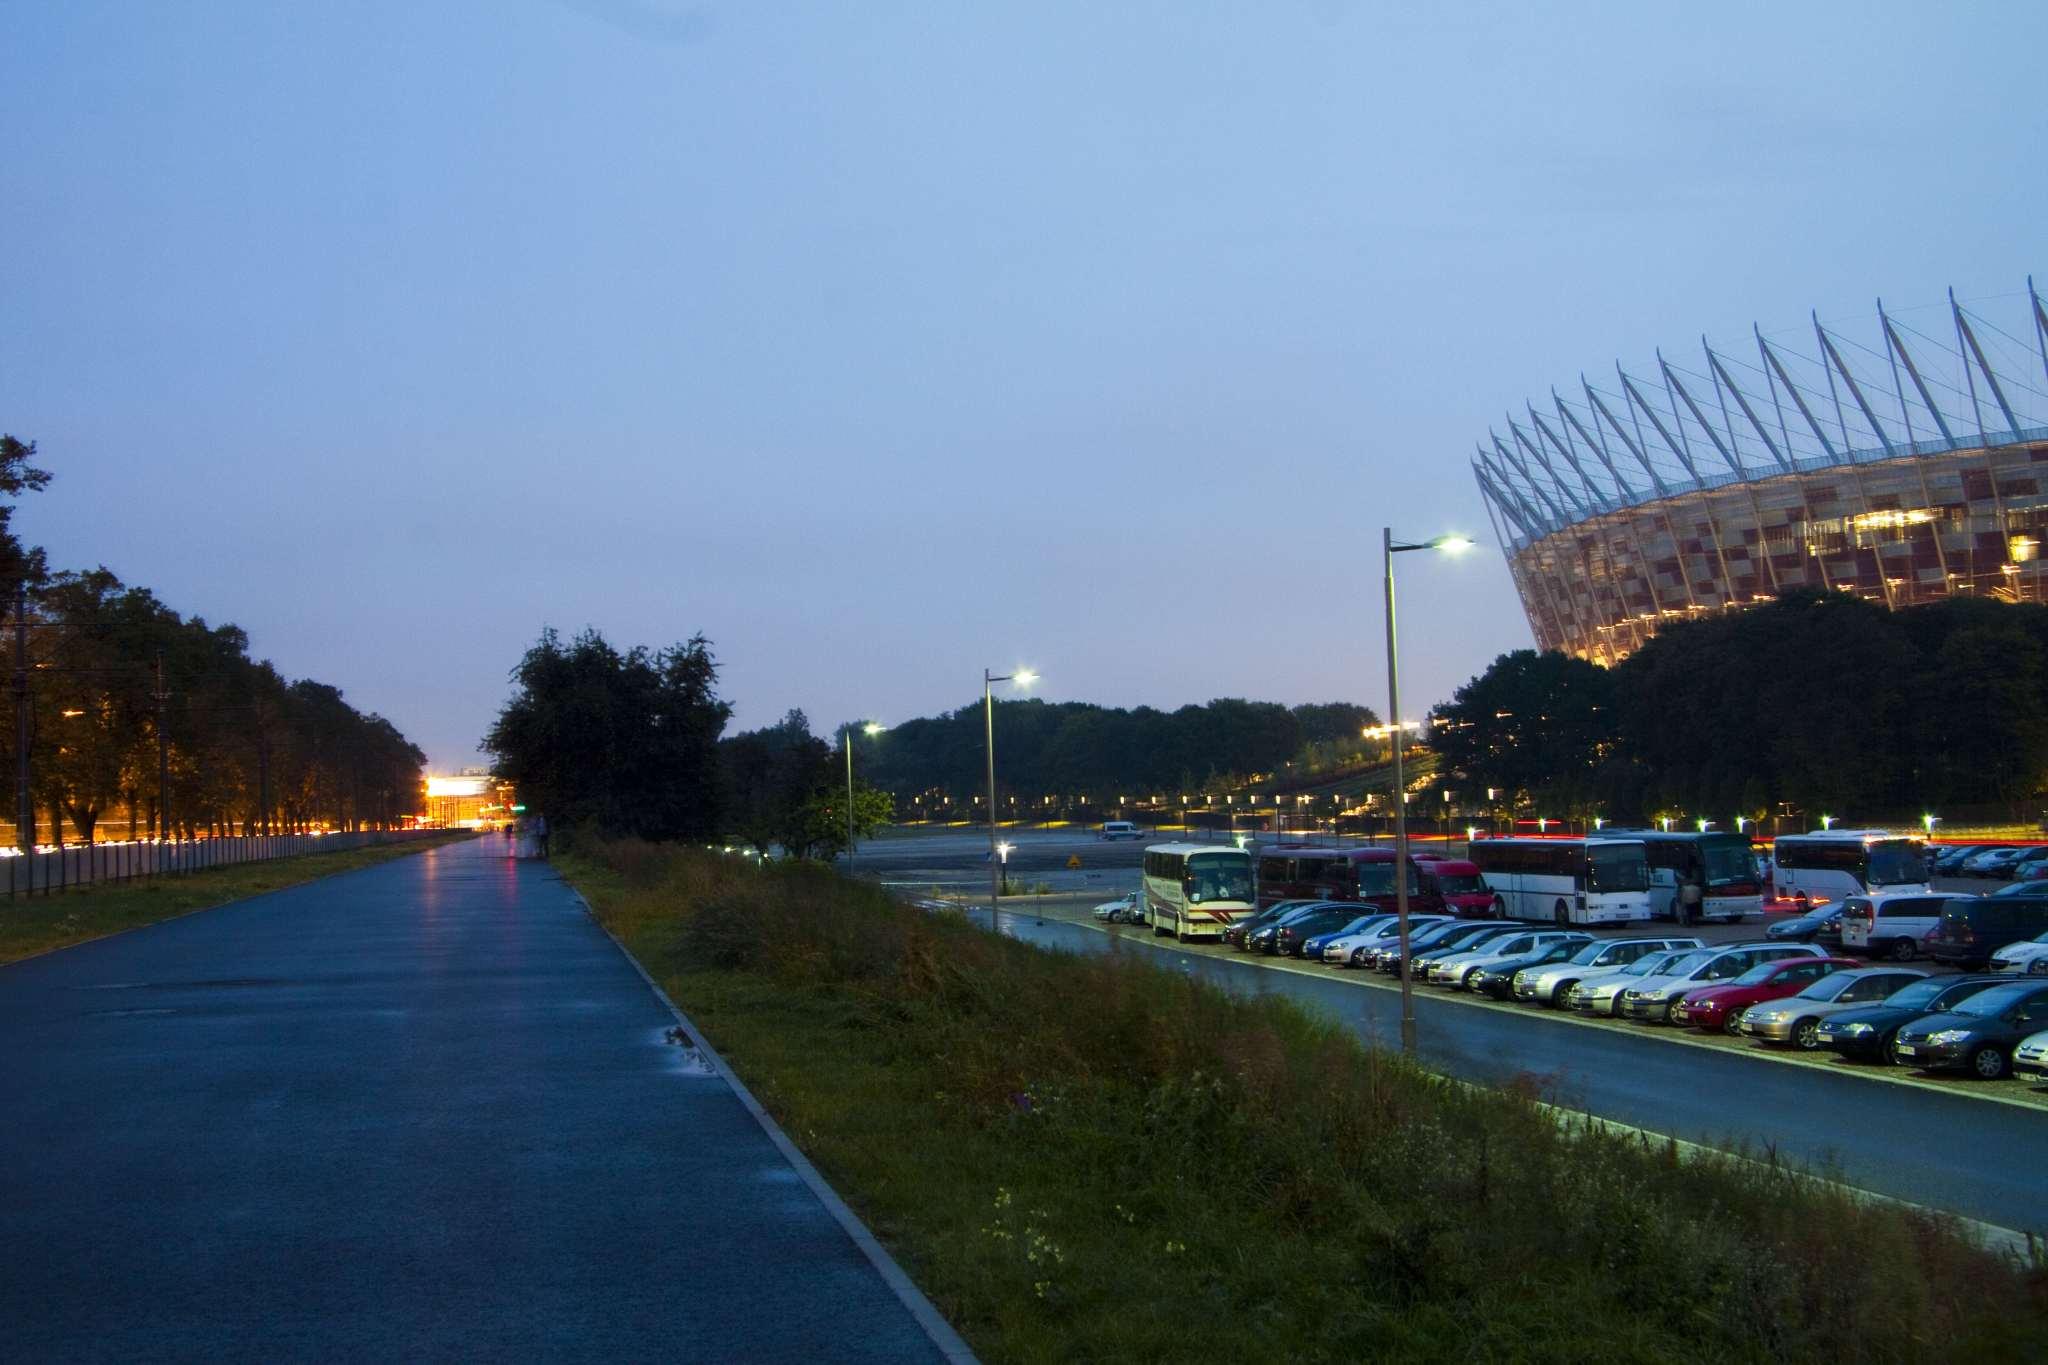 Narodowy Stadium 4